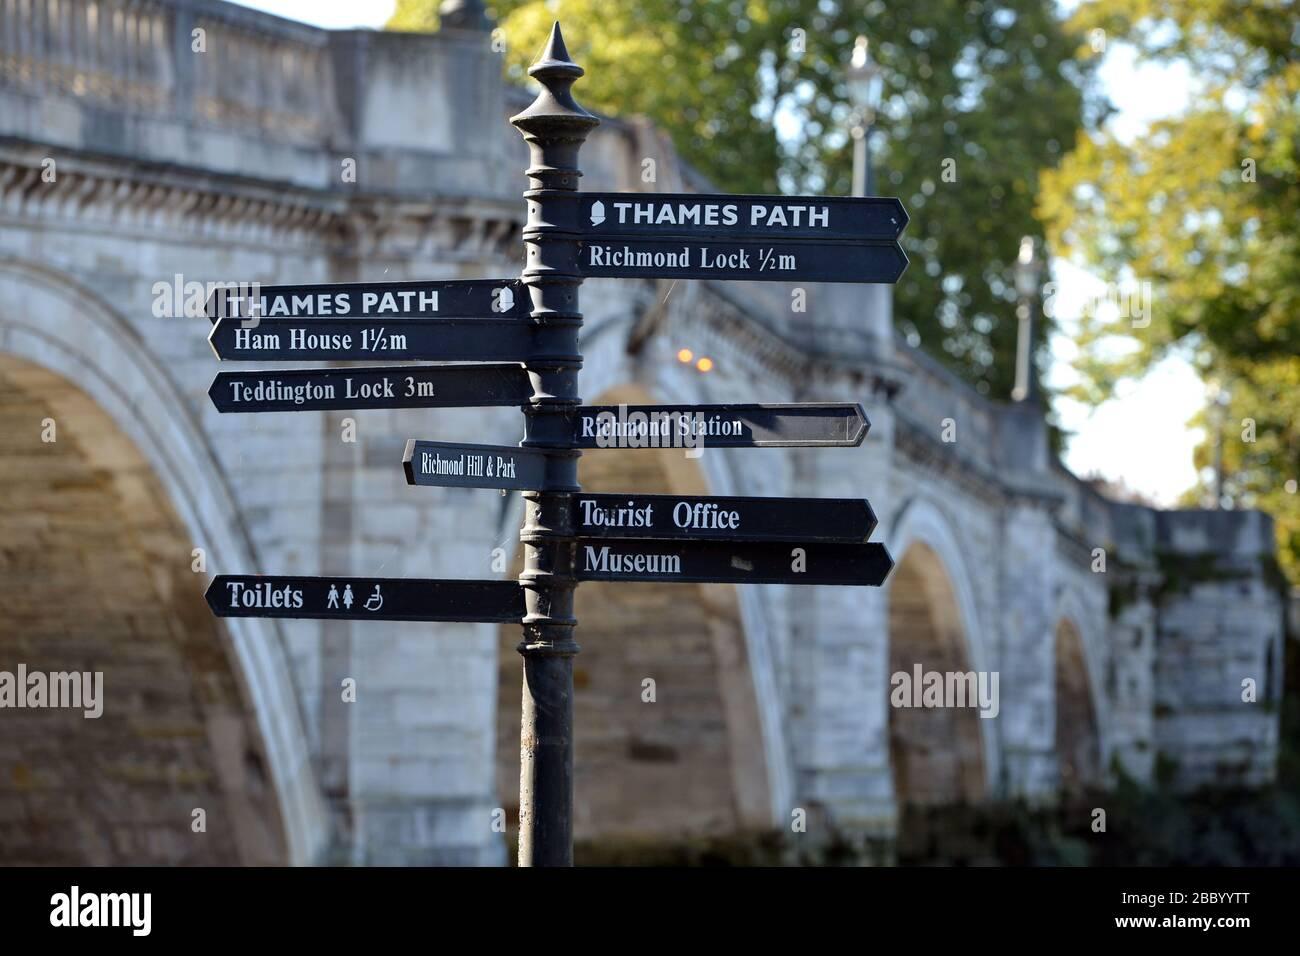 Thames Path signpost, Richmond Riverside, Richmond, London, UK Stock Photo